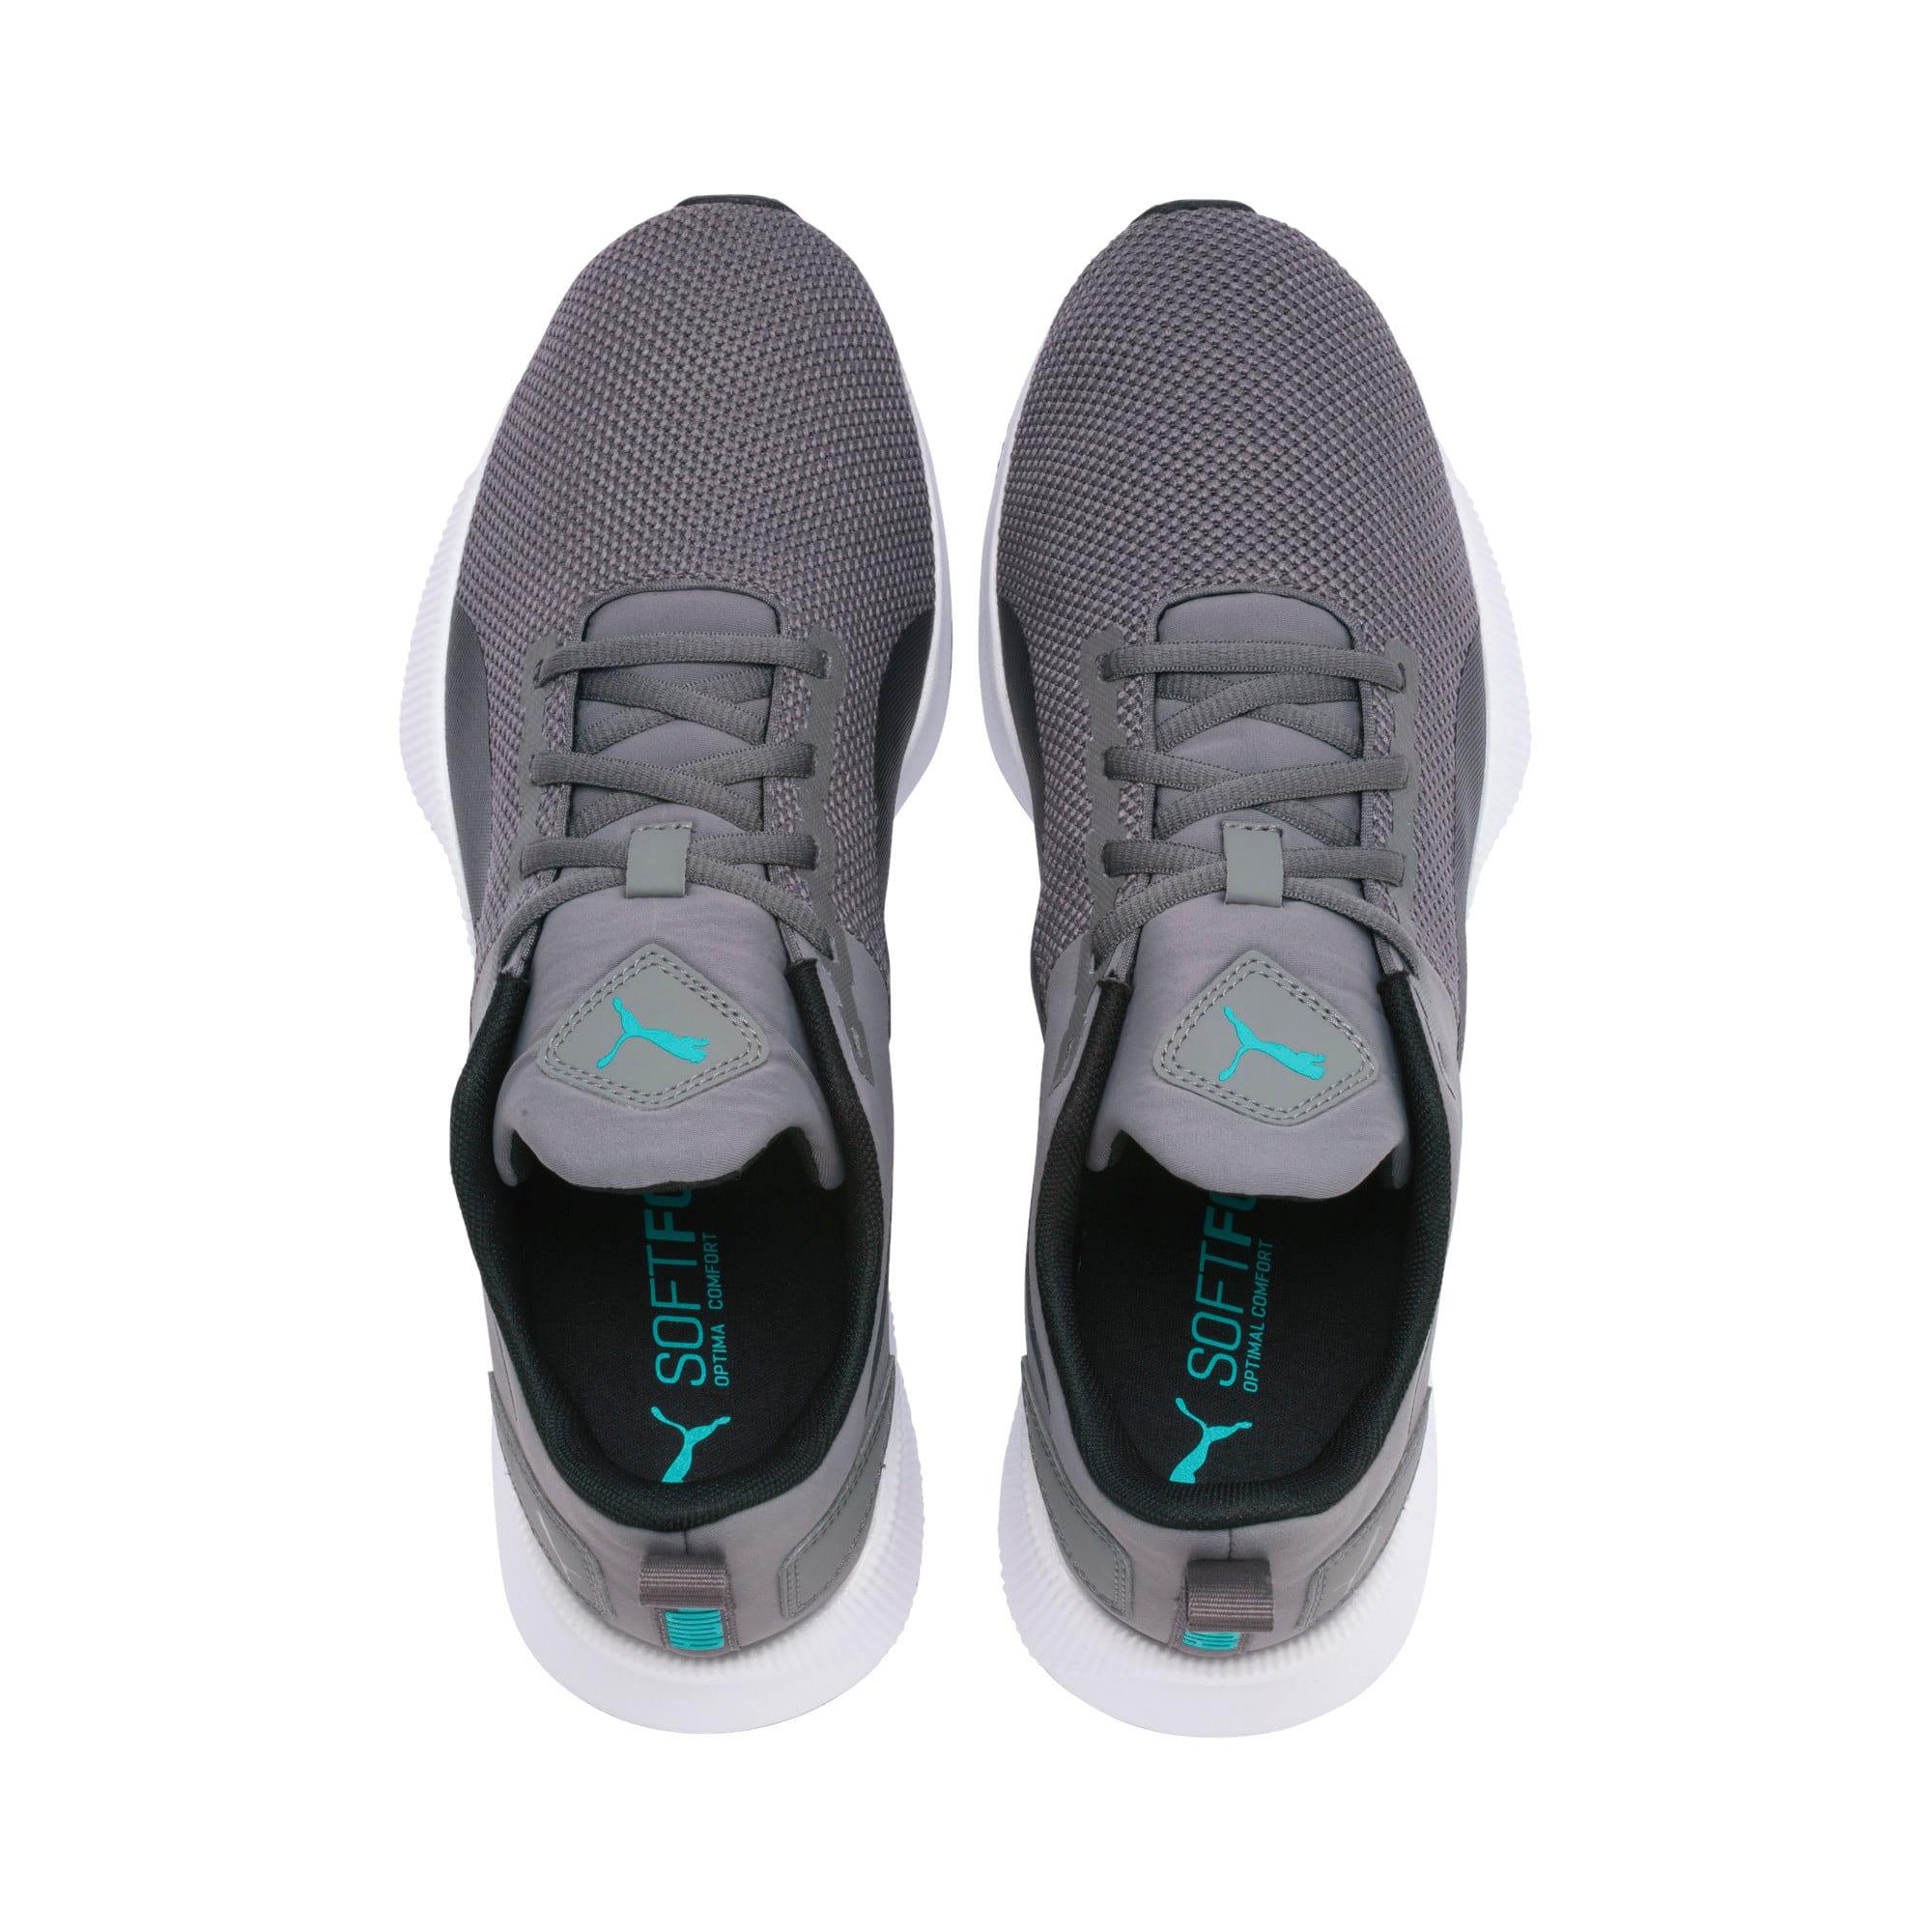 Thumbnail 7 of Flyer Runner Running Shoes, Charcoal-Black-Turquoise, medium